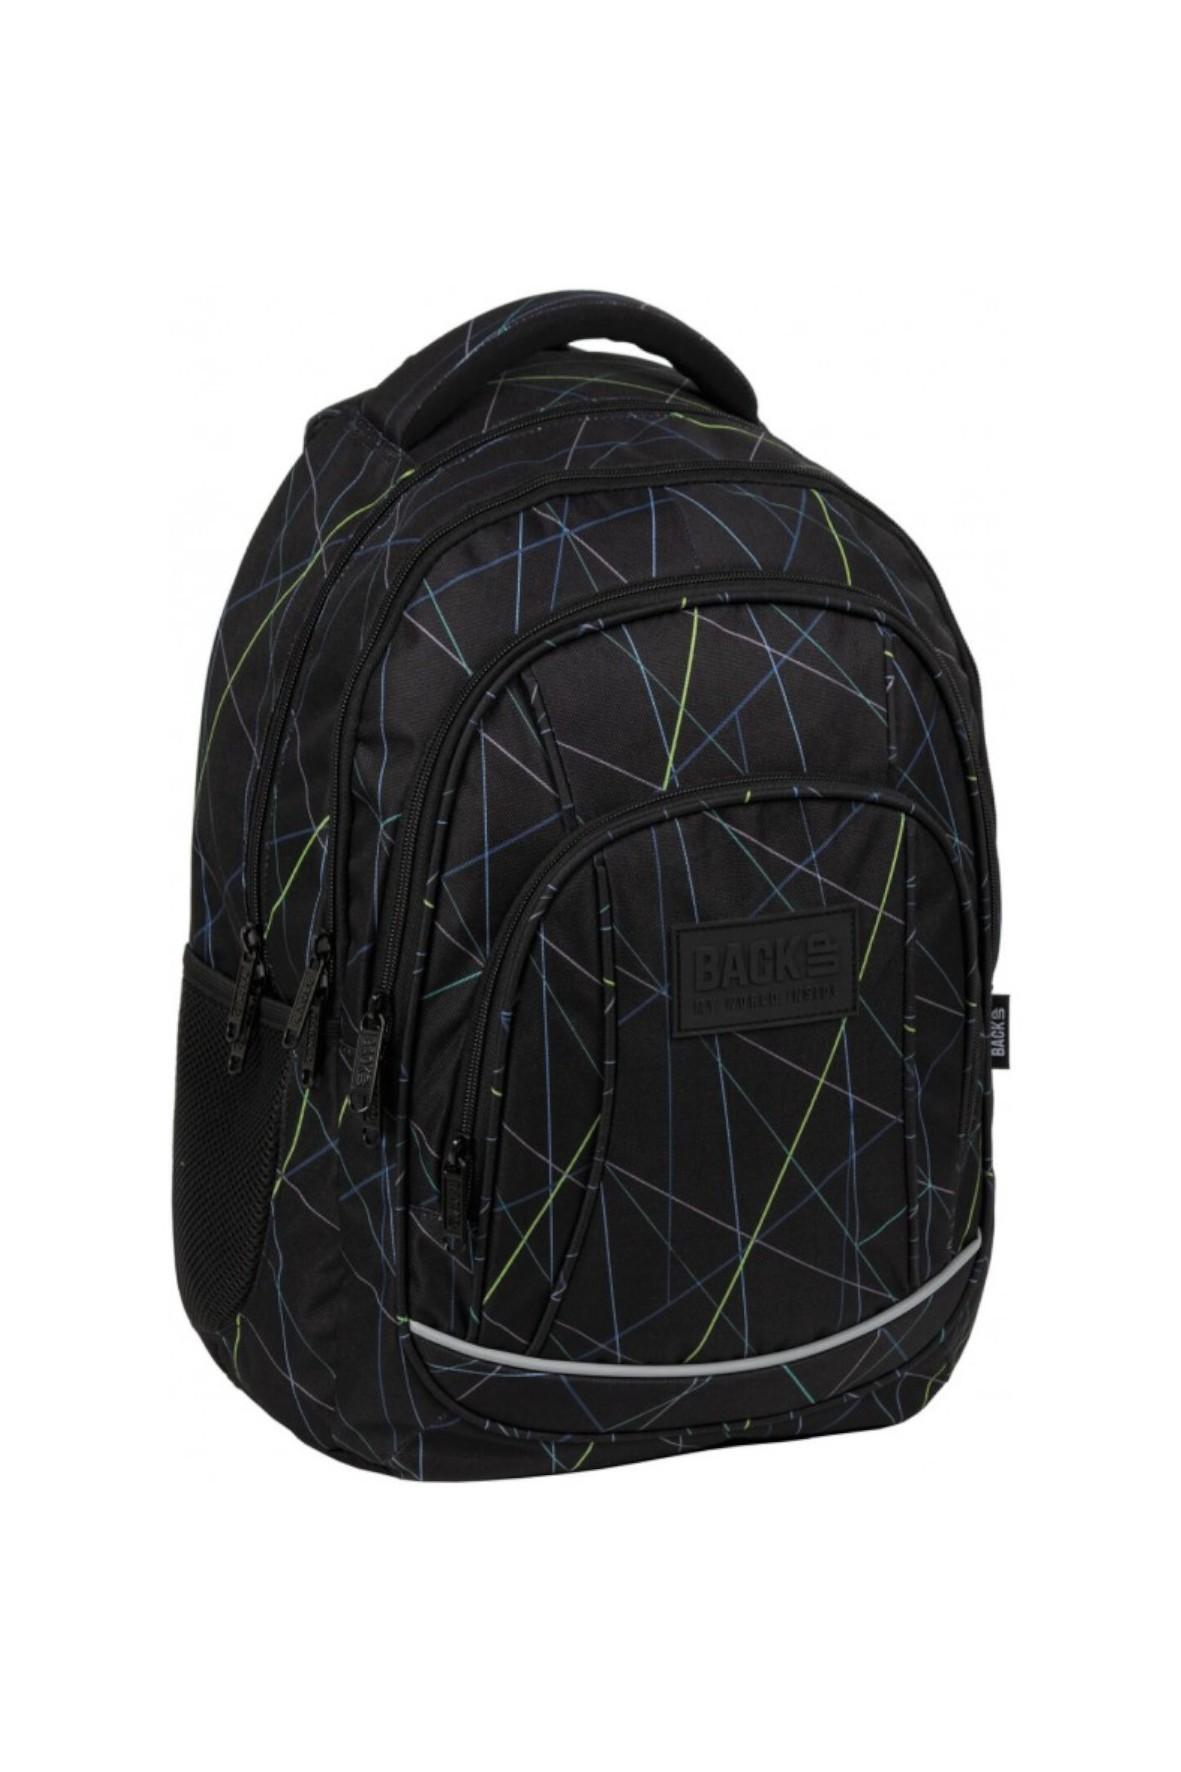 Plecak szkolny dla chłopca BackUp Laser